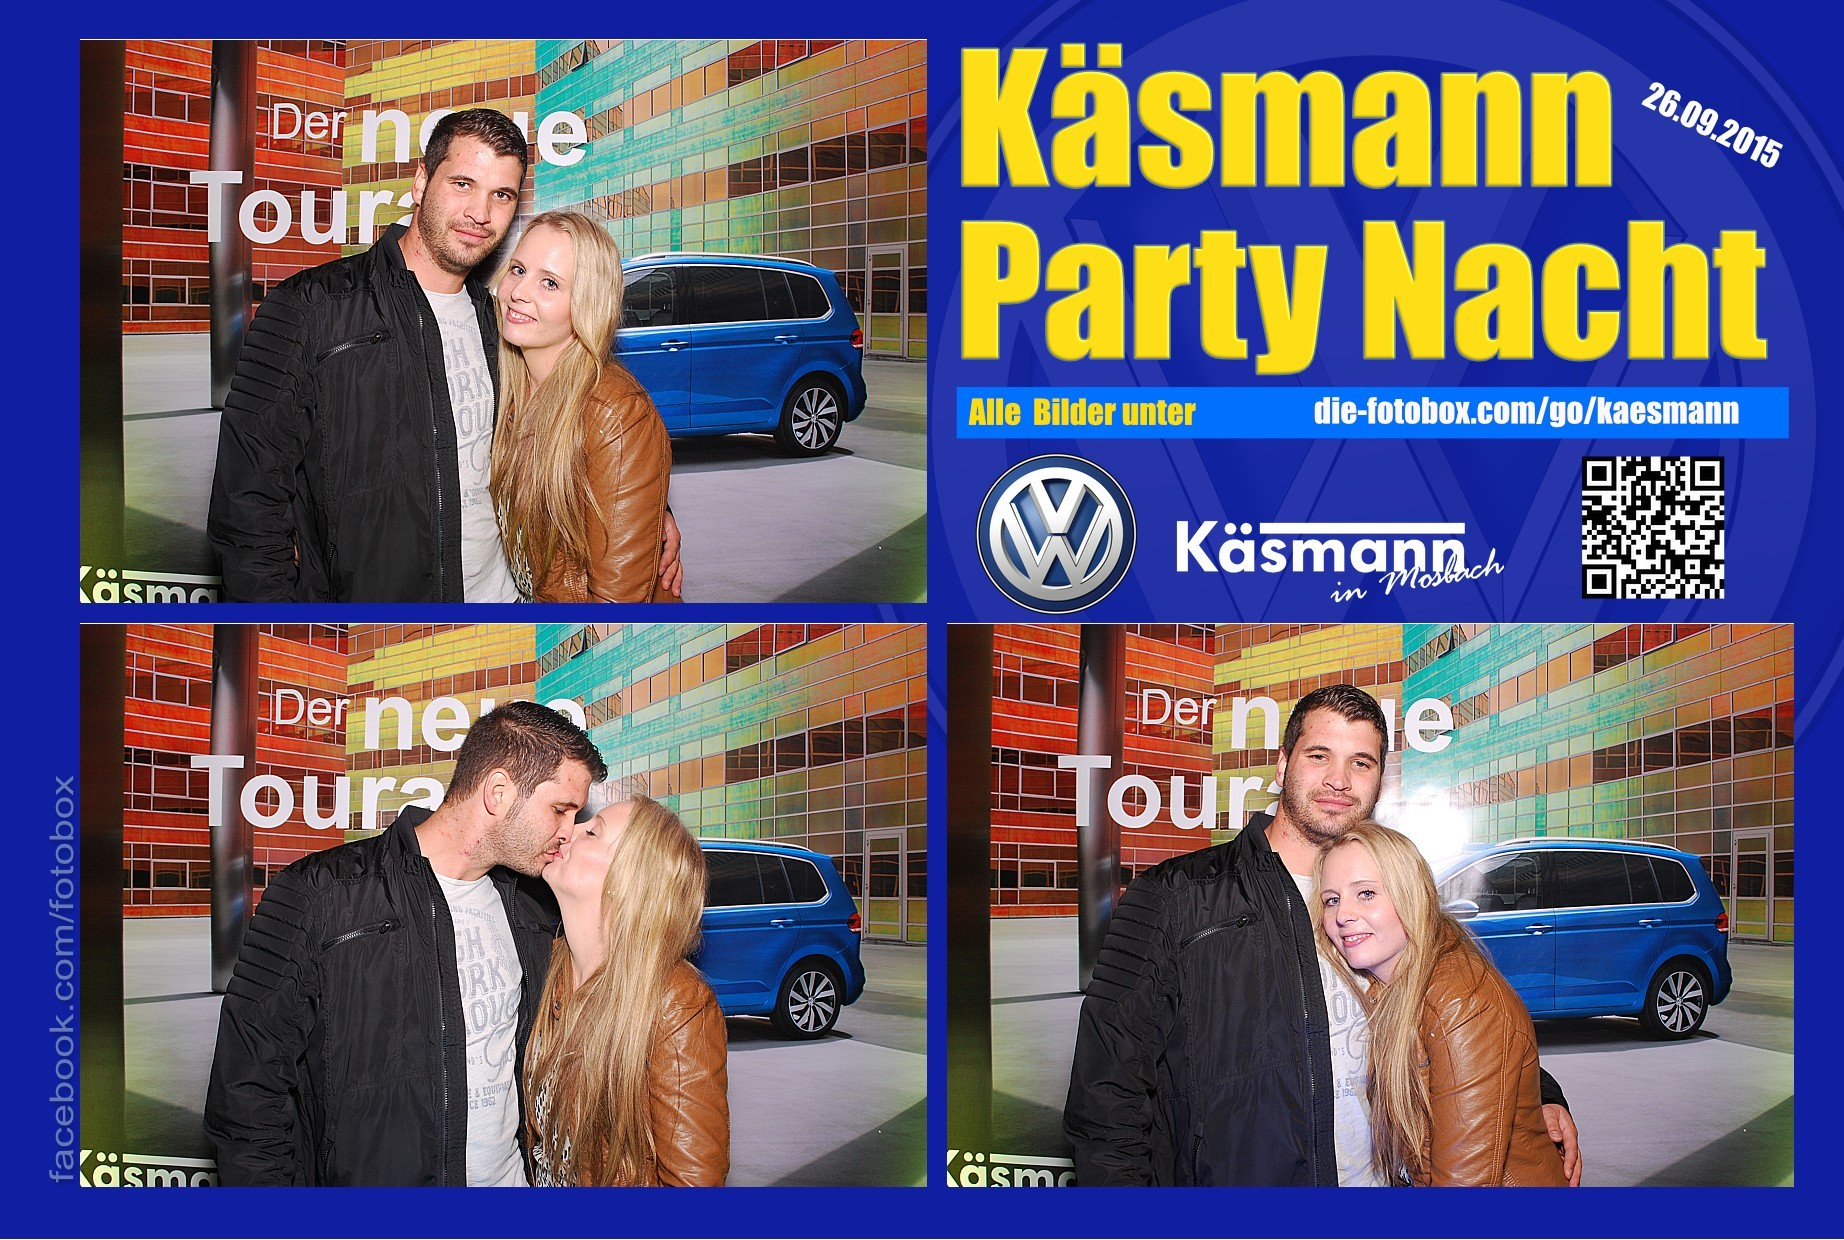 Käsmannparty 2015 - www.die-fotobox.com 01280